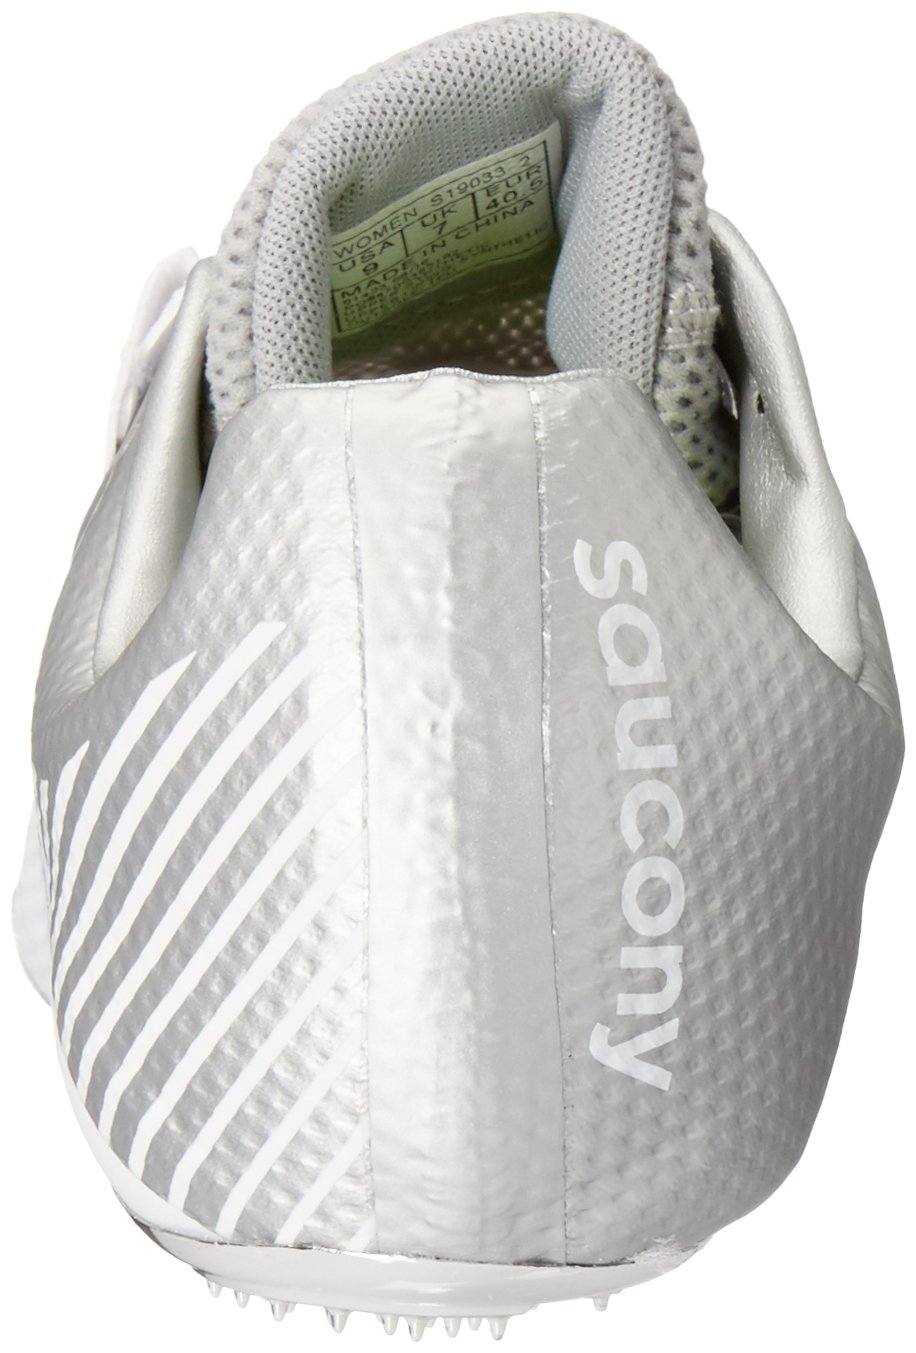 Saucony Women's Showdown 4 Track Shoe White/Silver 10 M US by Saucony (Image #2)